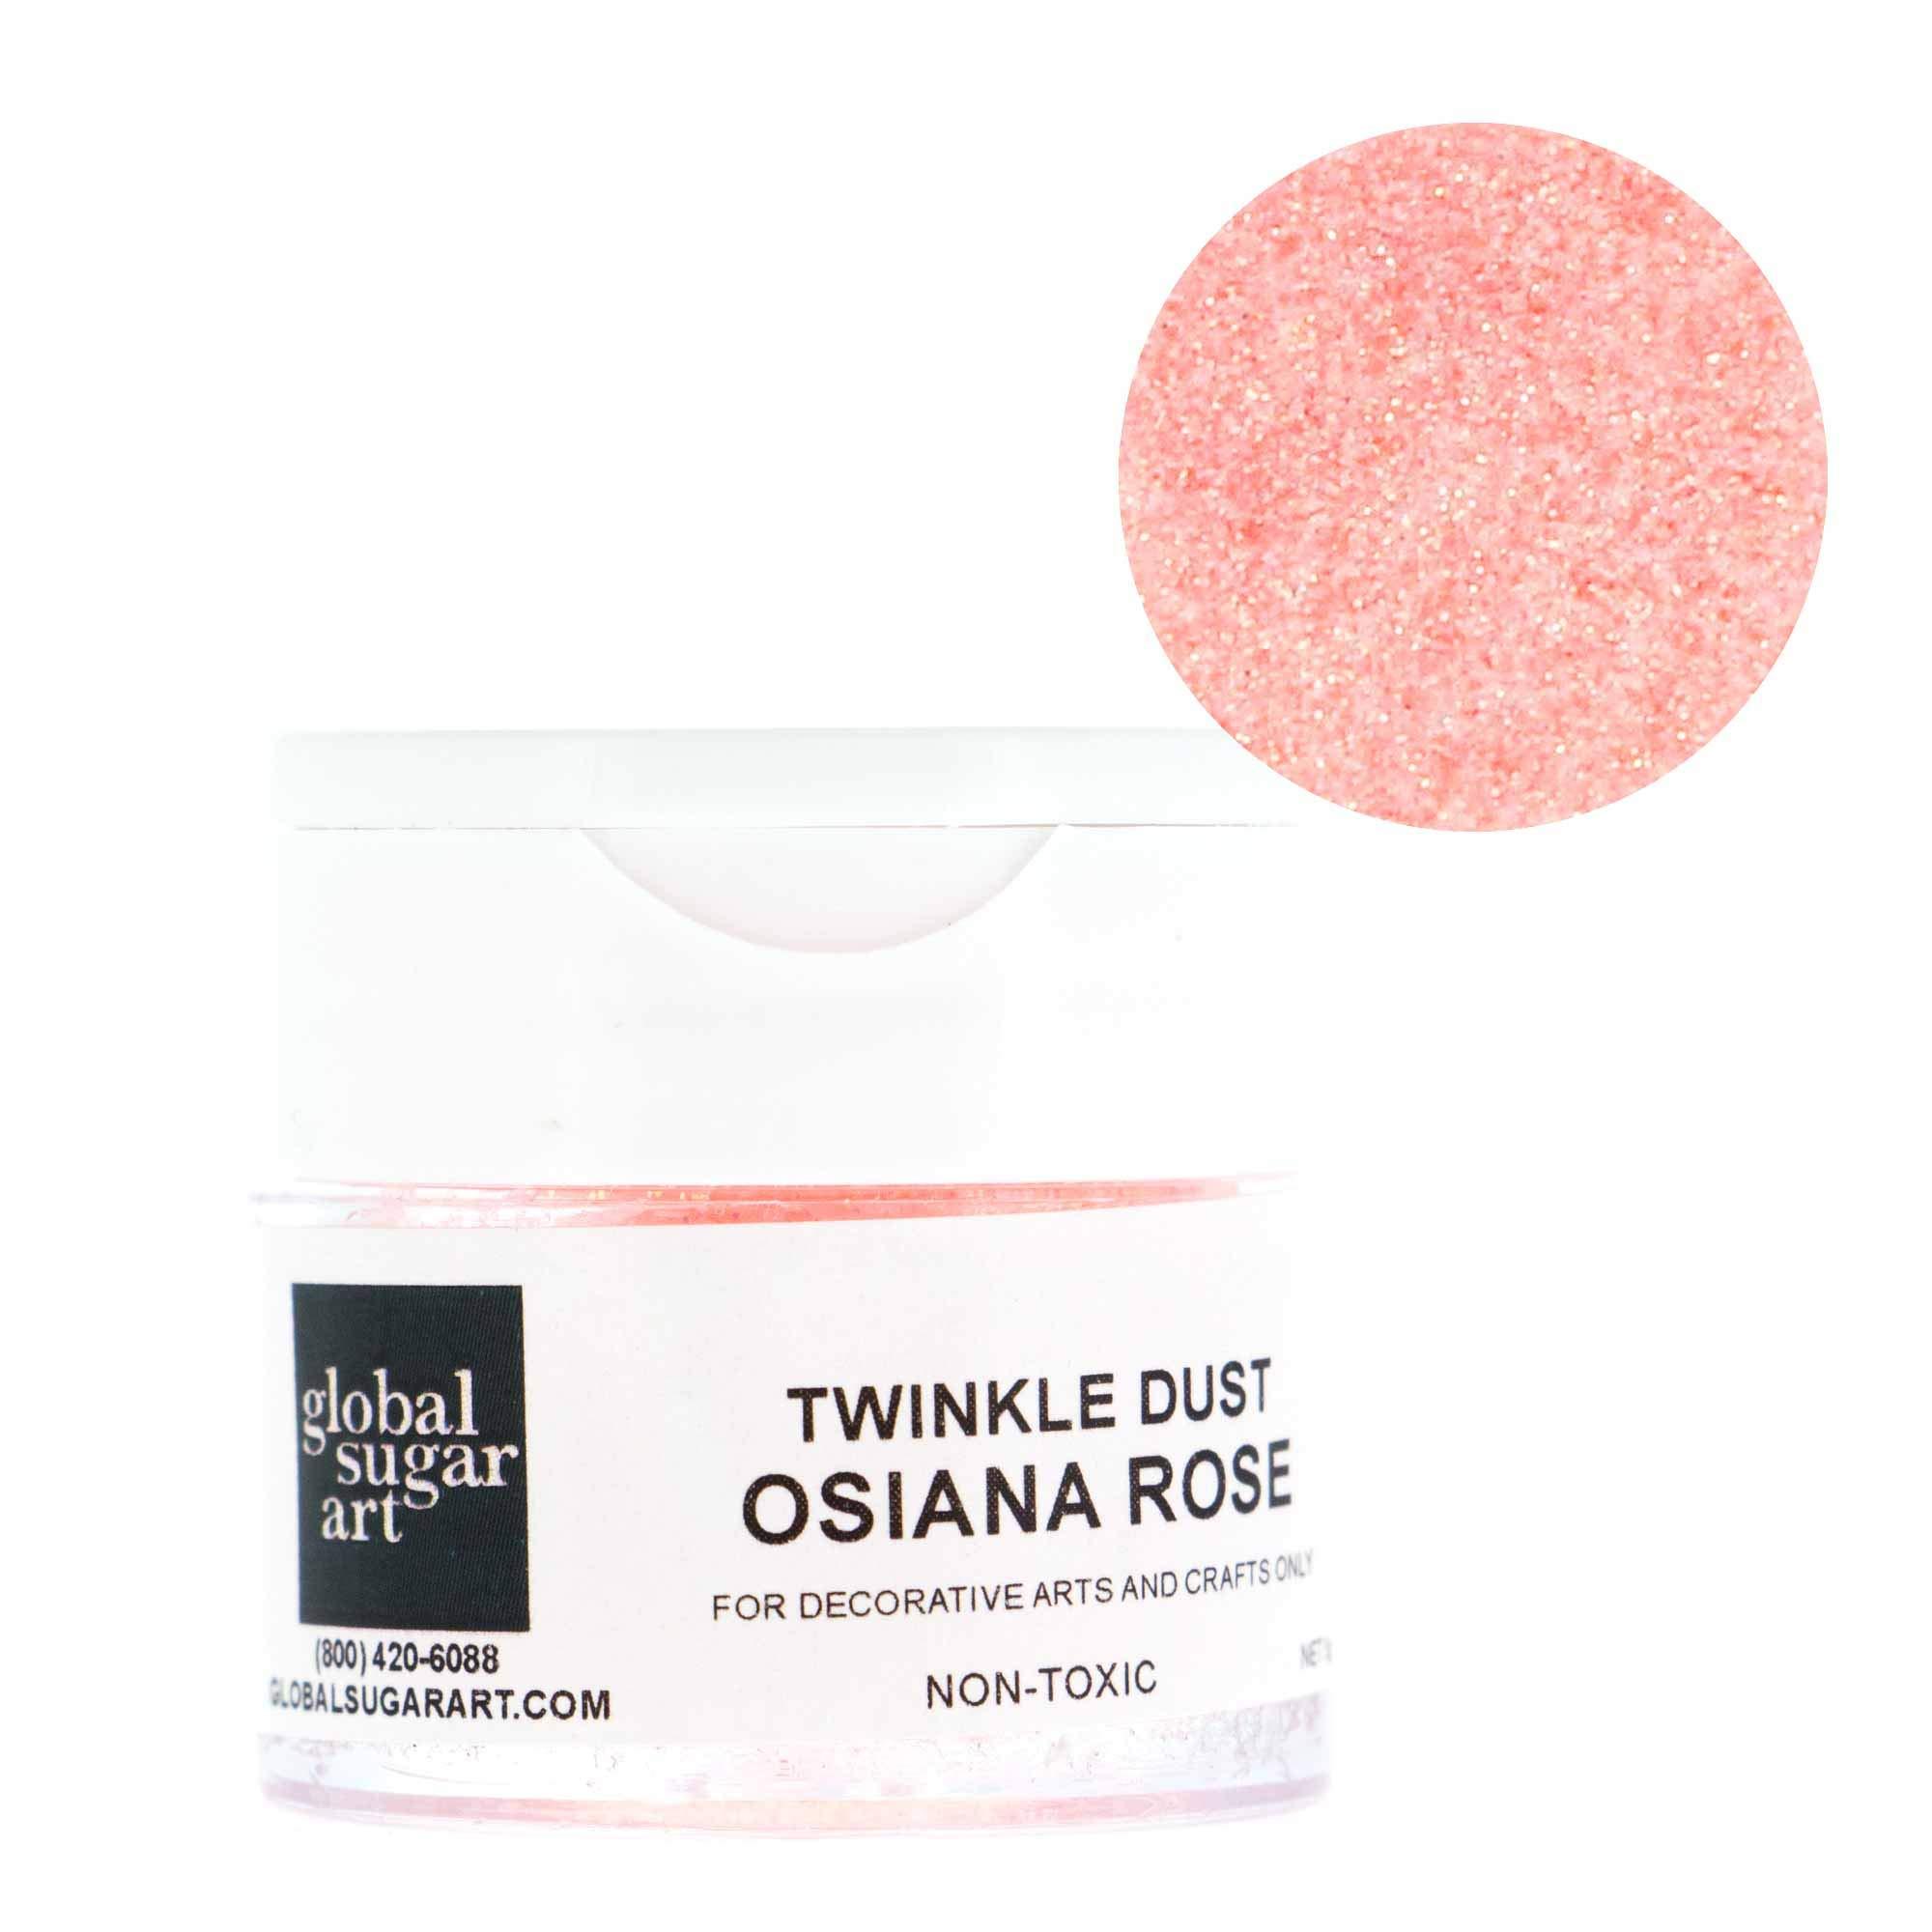 Osiana Rose Twinkle Dust by Global Sugar Art